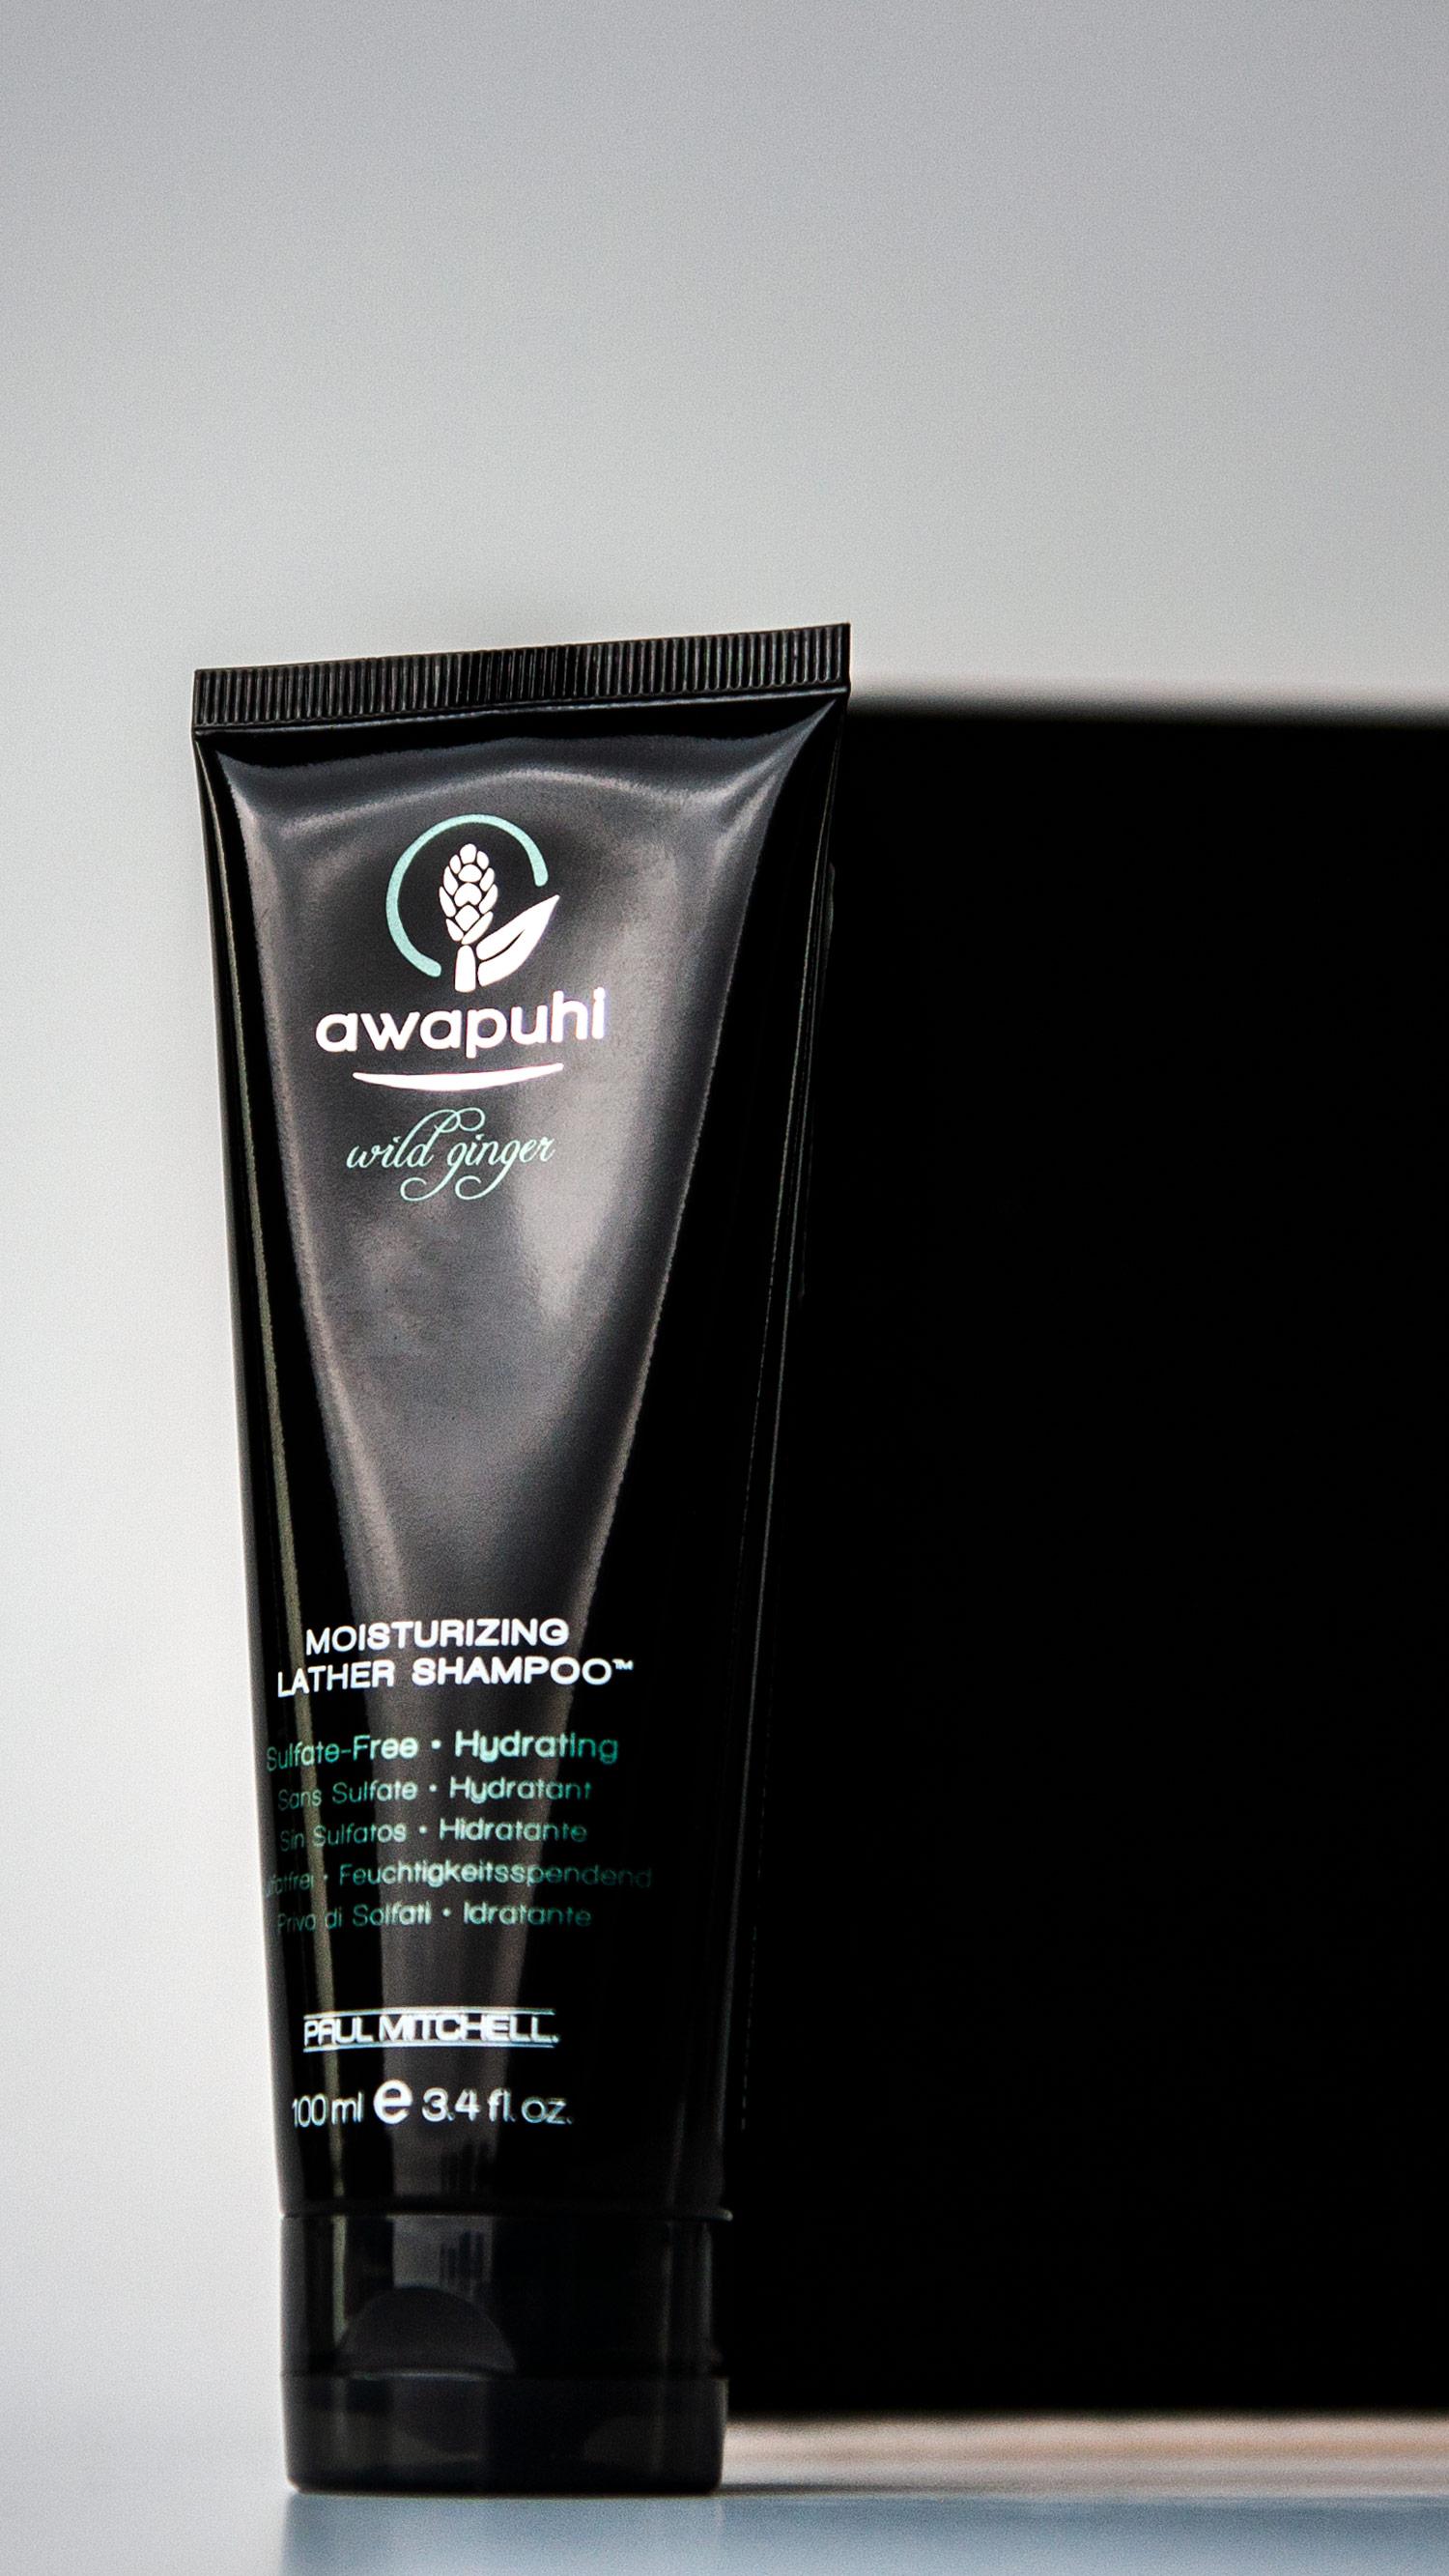 увлажняющий шампунь Awapuhi Moisturizing Lather Shampoo